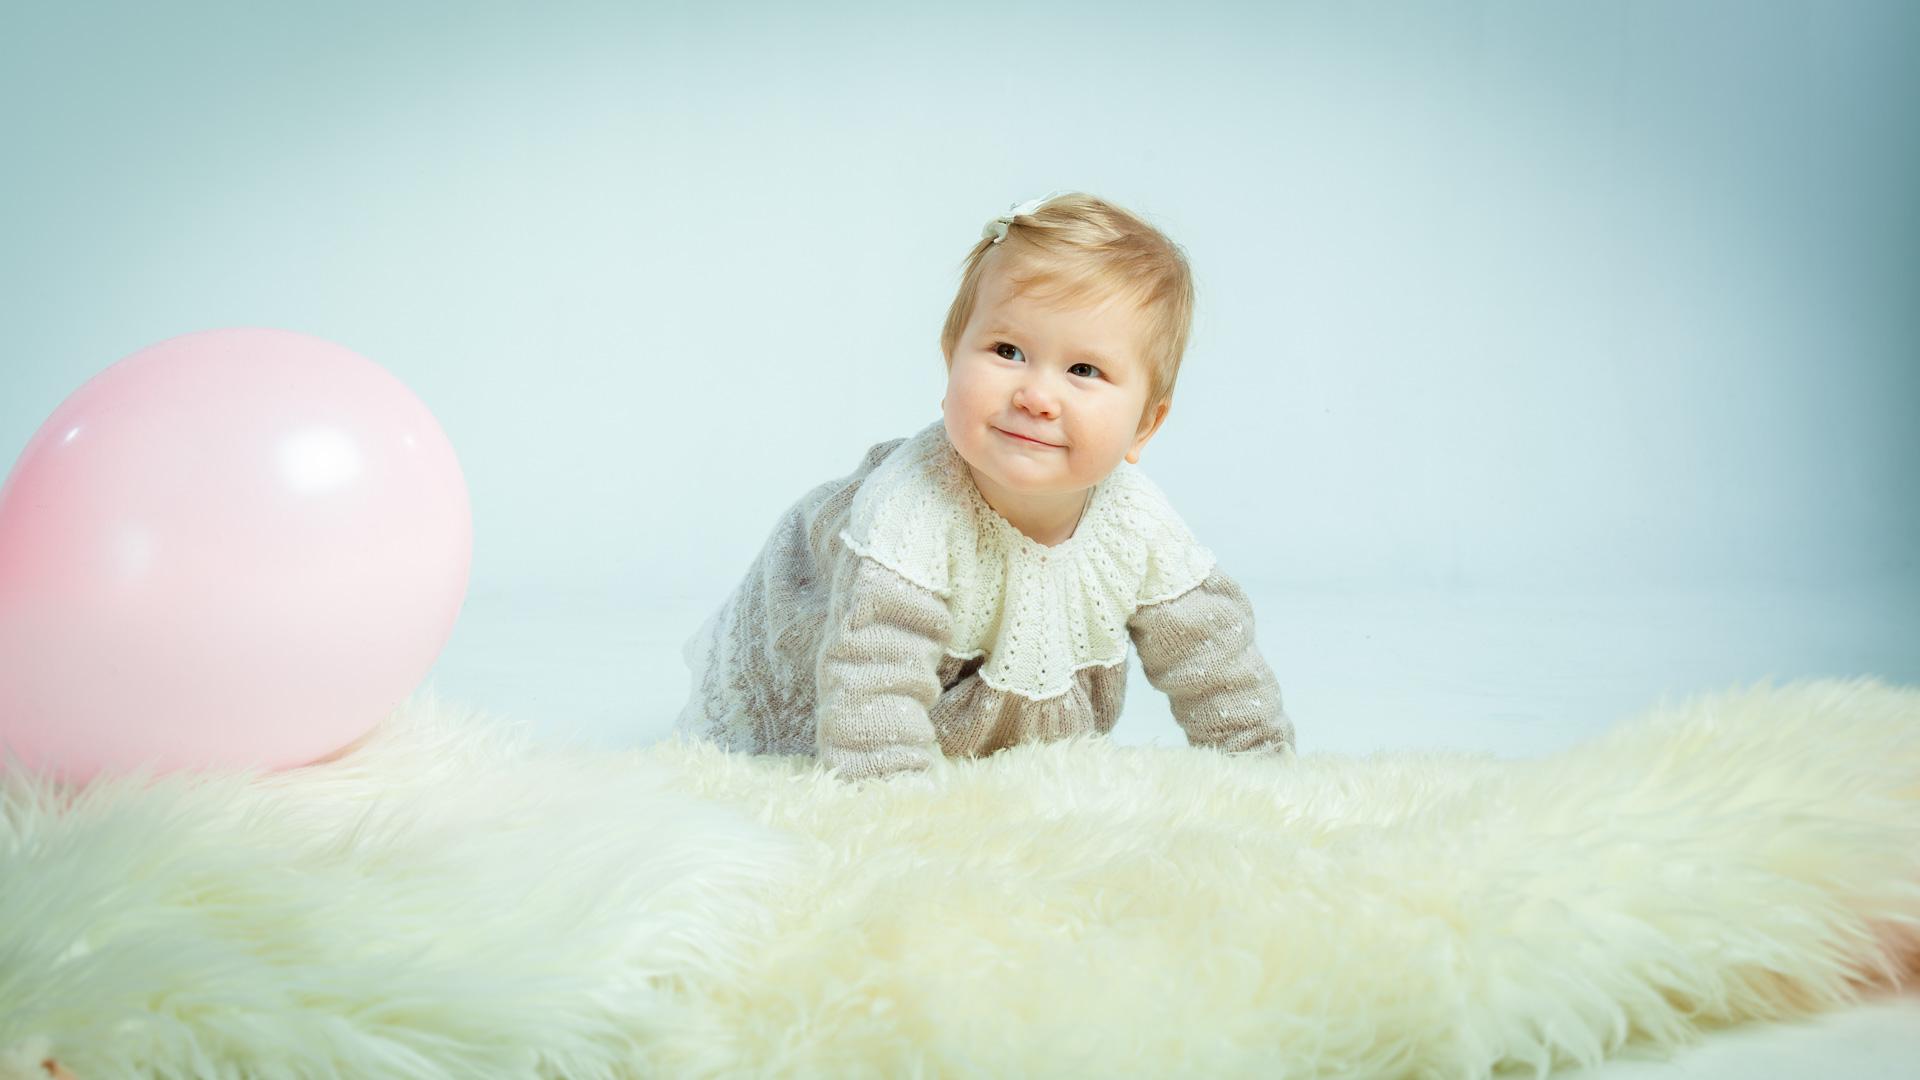 Barnefotografering studiofotografering Sandefjord